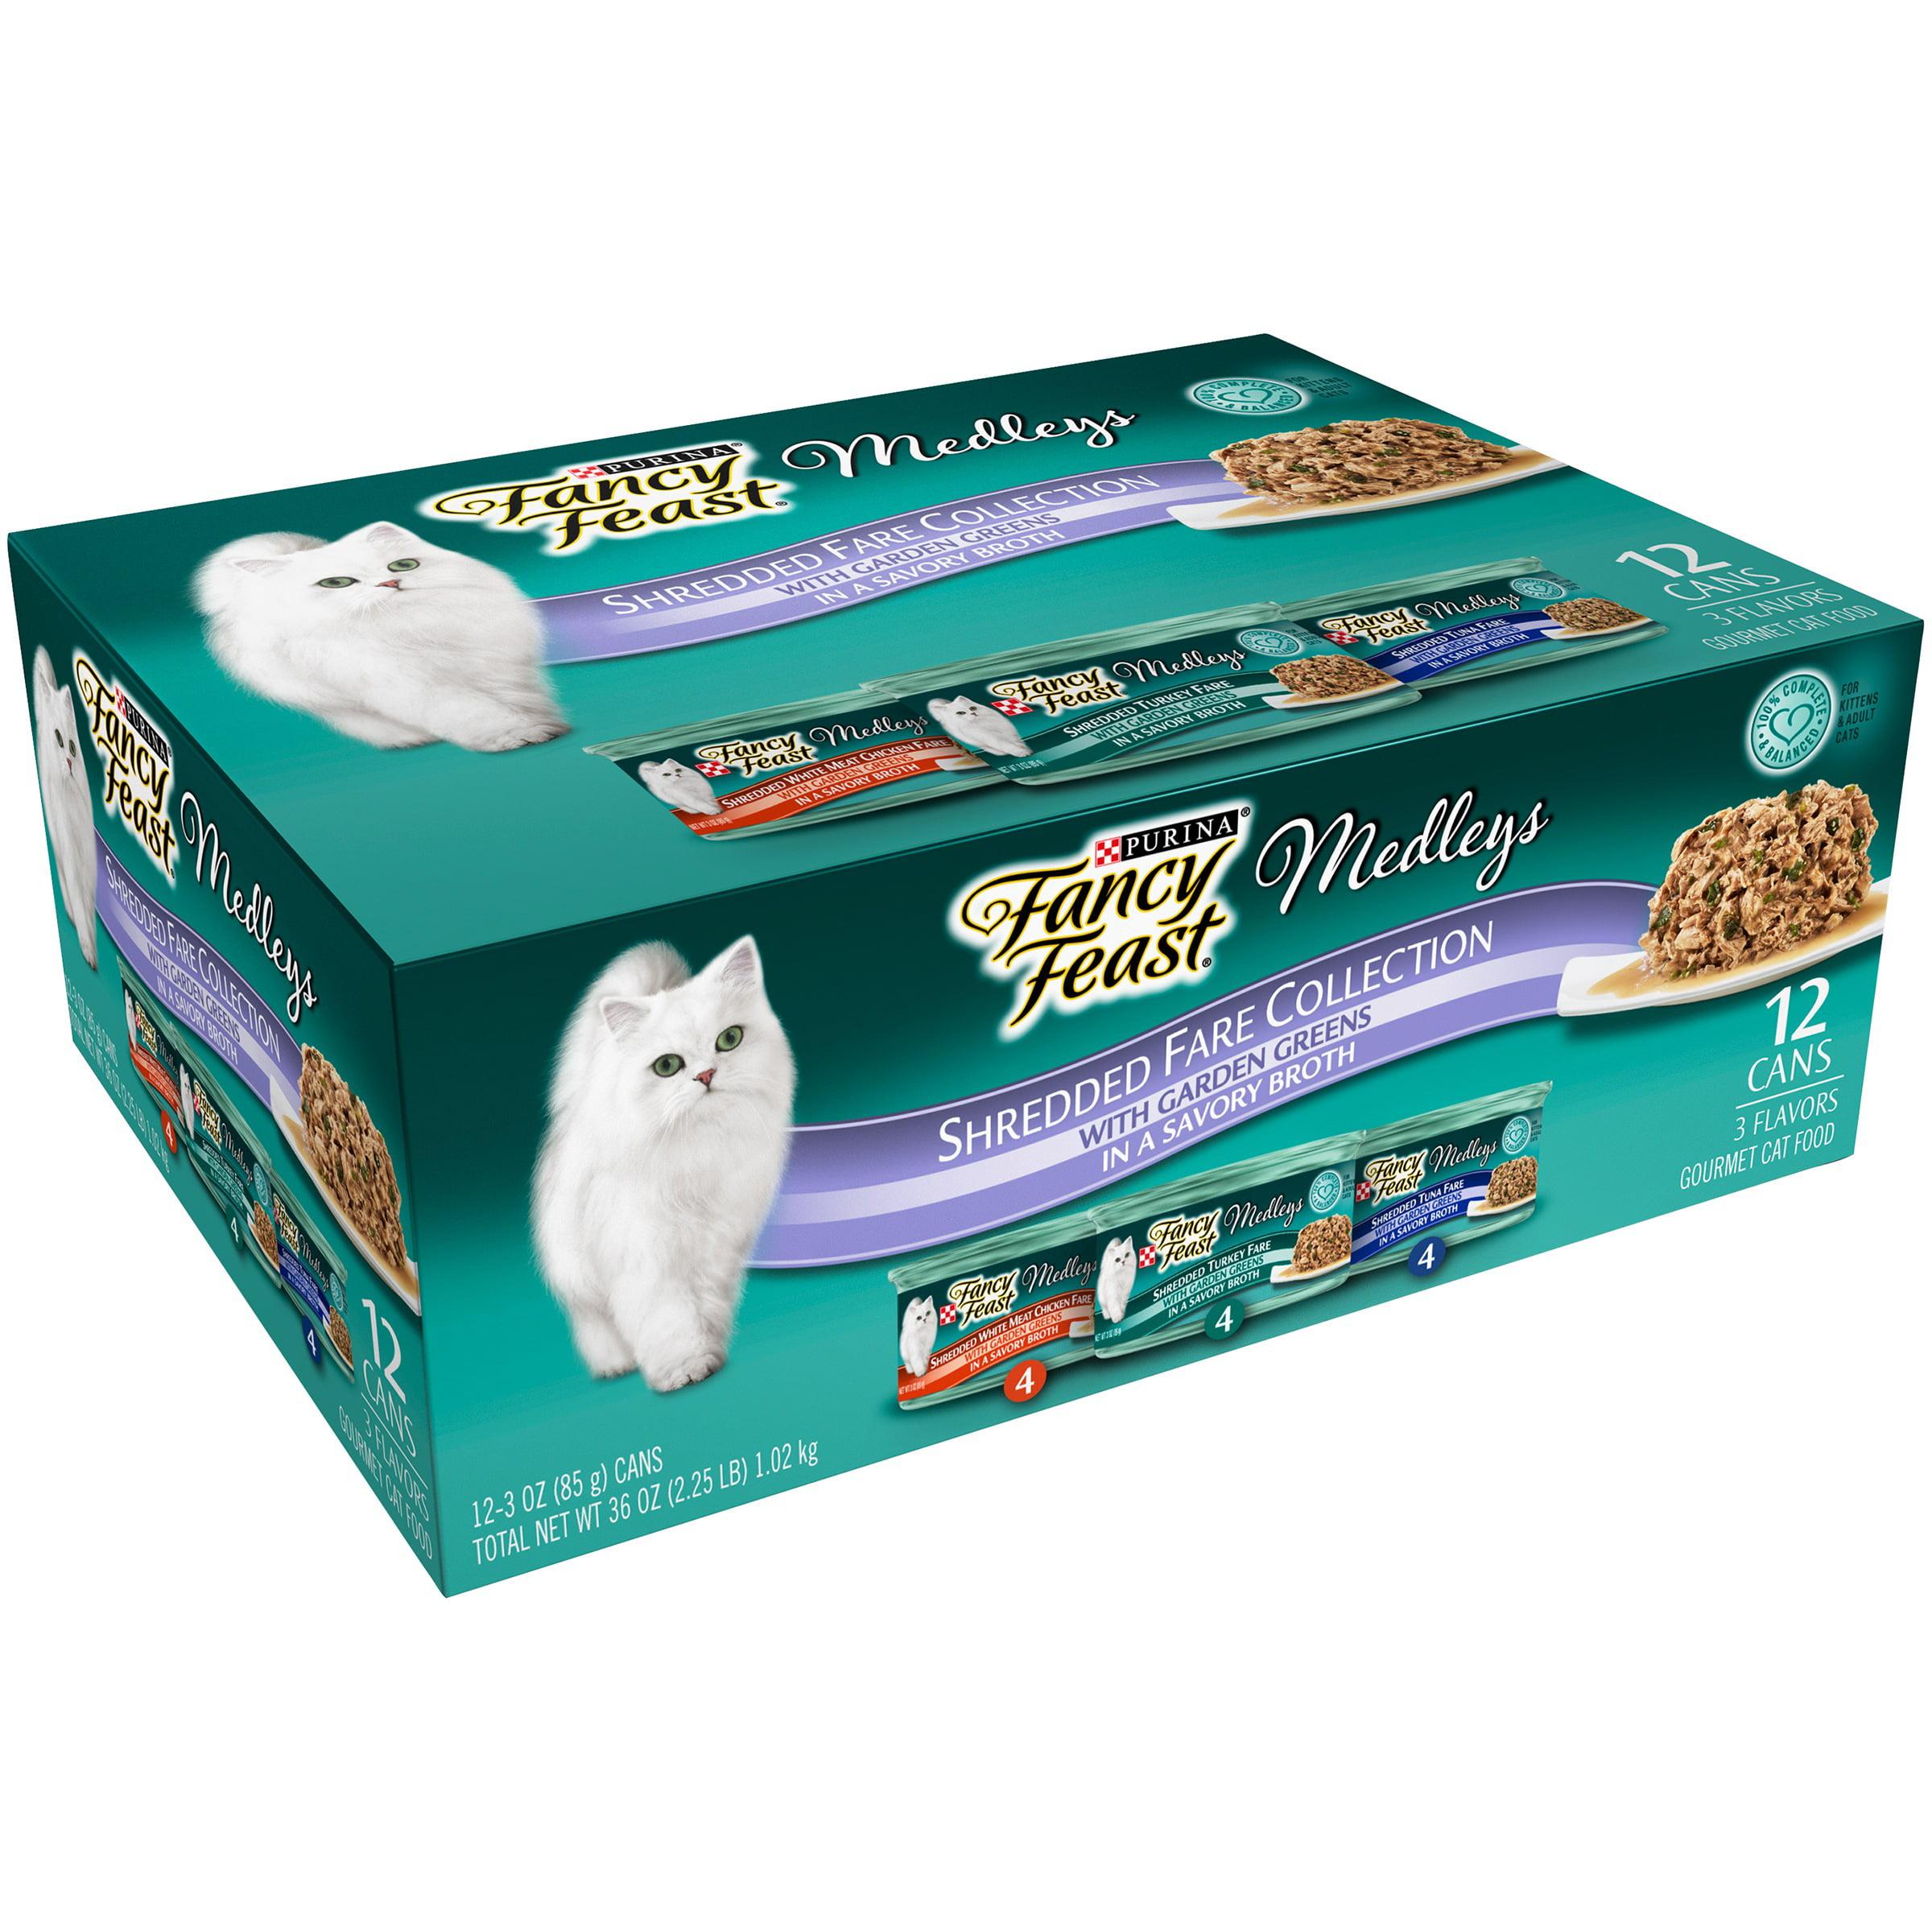 Nestl Purina PetCare Company Nestl Purina Pet Care Company Purina Fancy Feast Medleys Shredded Fare Collection Cat Food 12 - 3 Oz. Cans